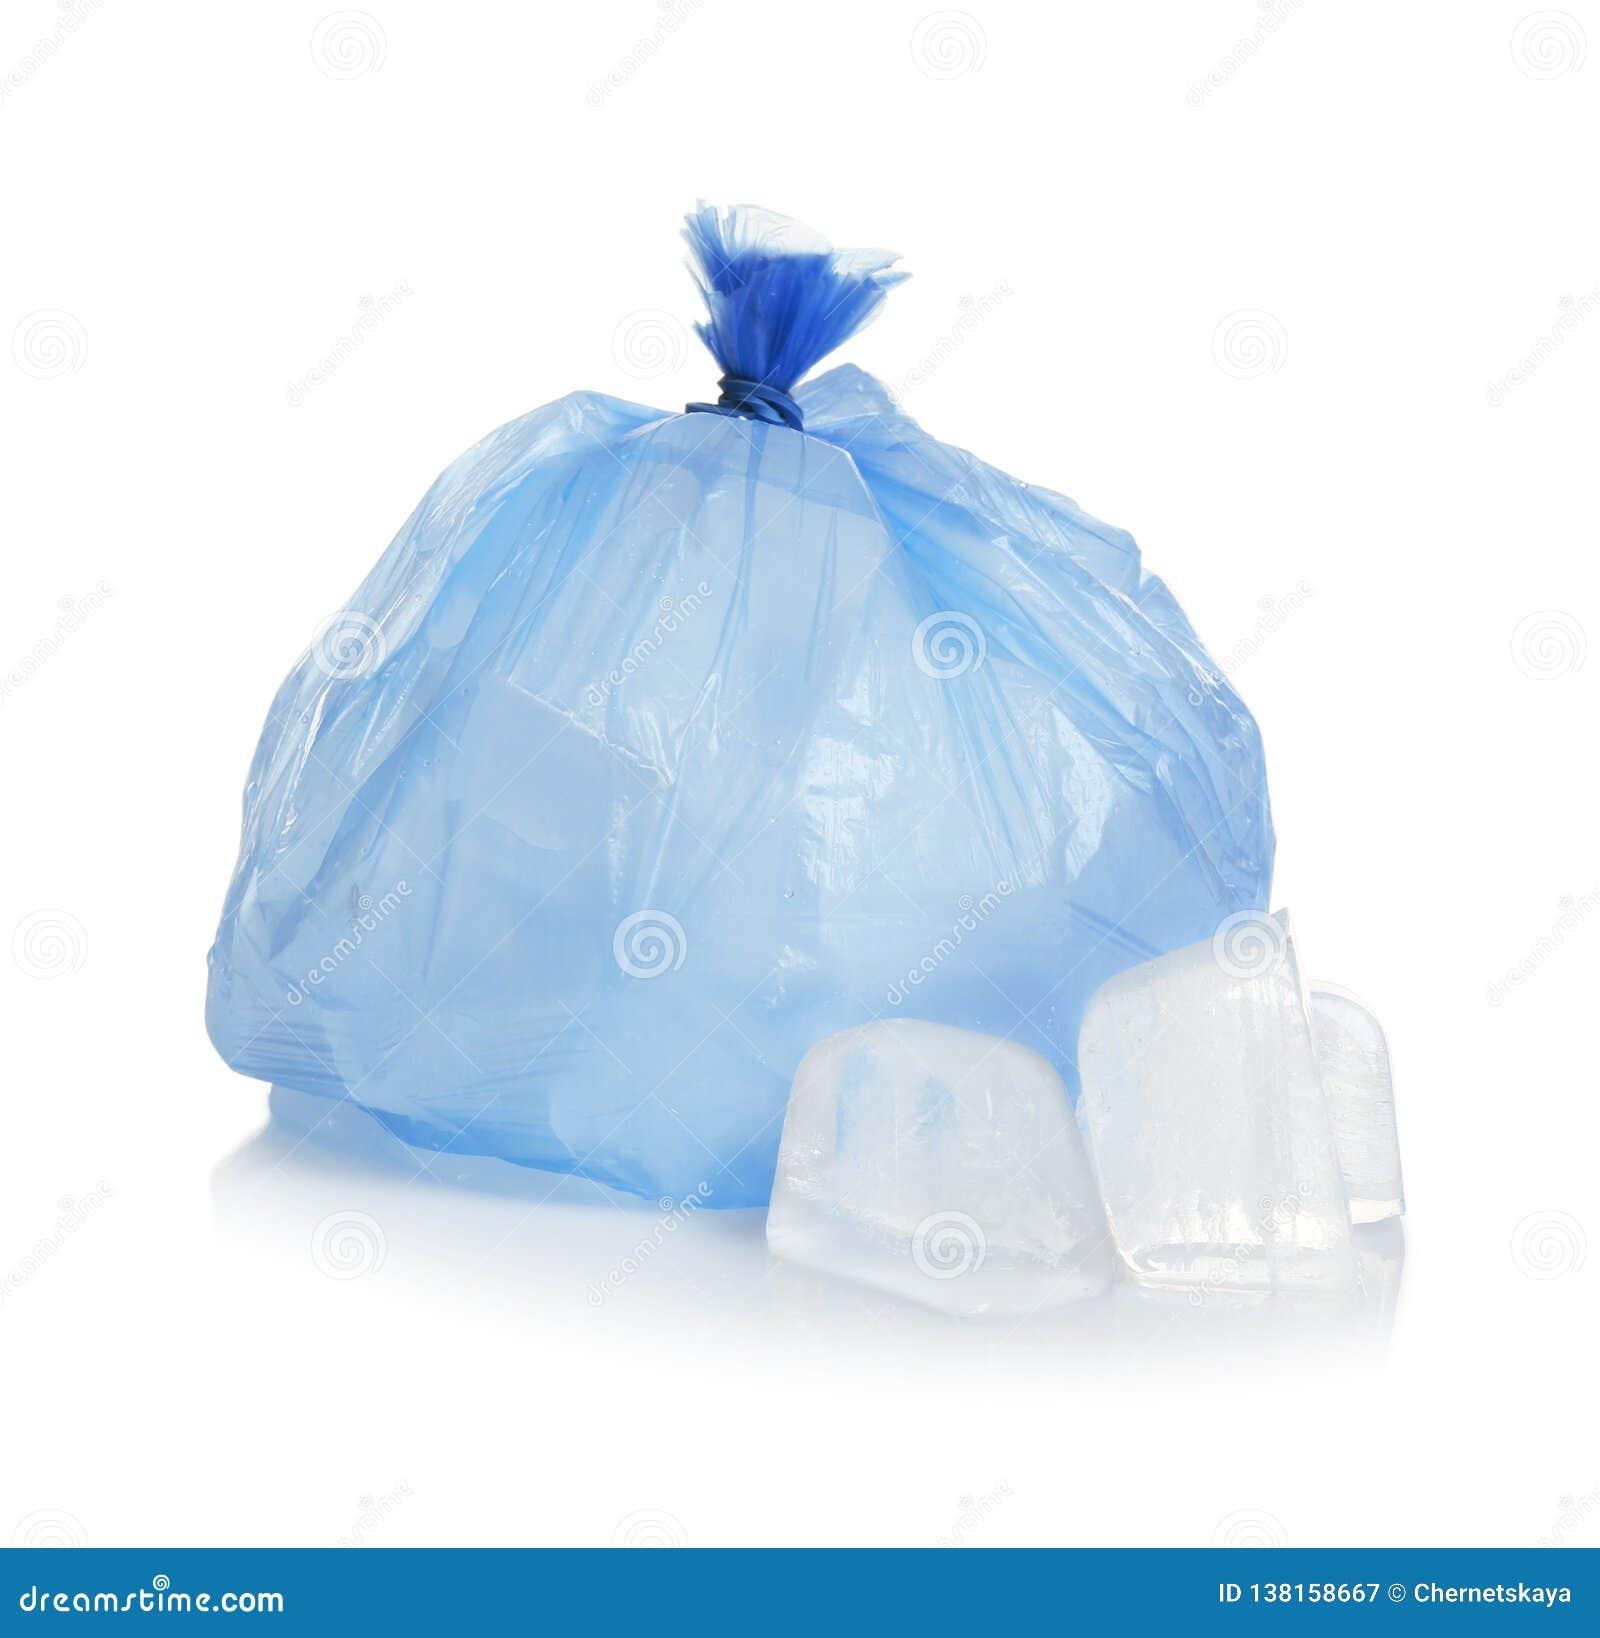 Saco de plástico com os cubos de gelo no branco